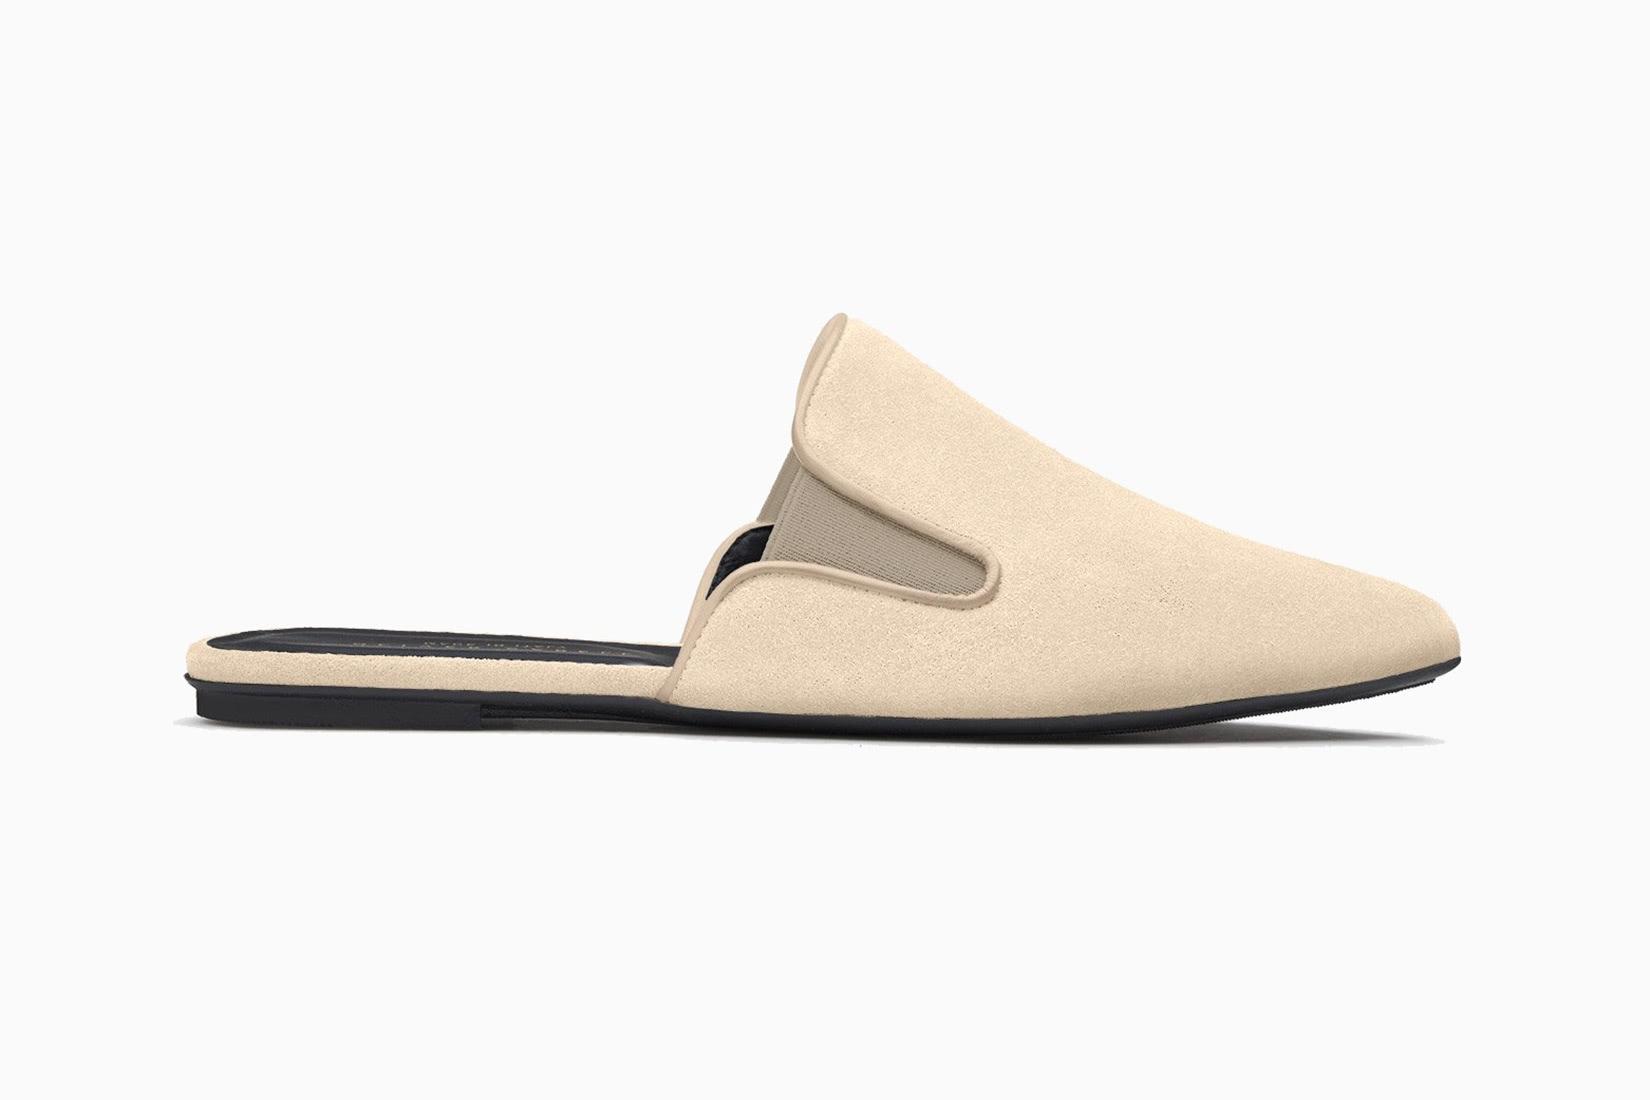 best women walking shoes oliver cabell dream mule - Luxe Digital